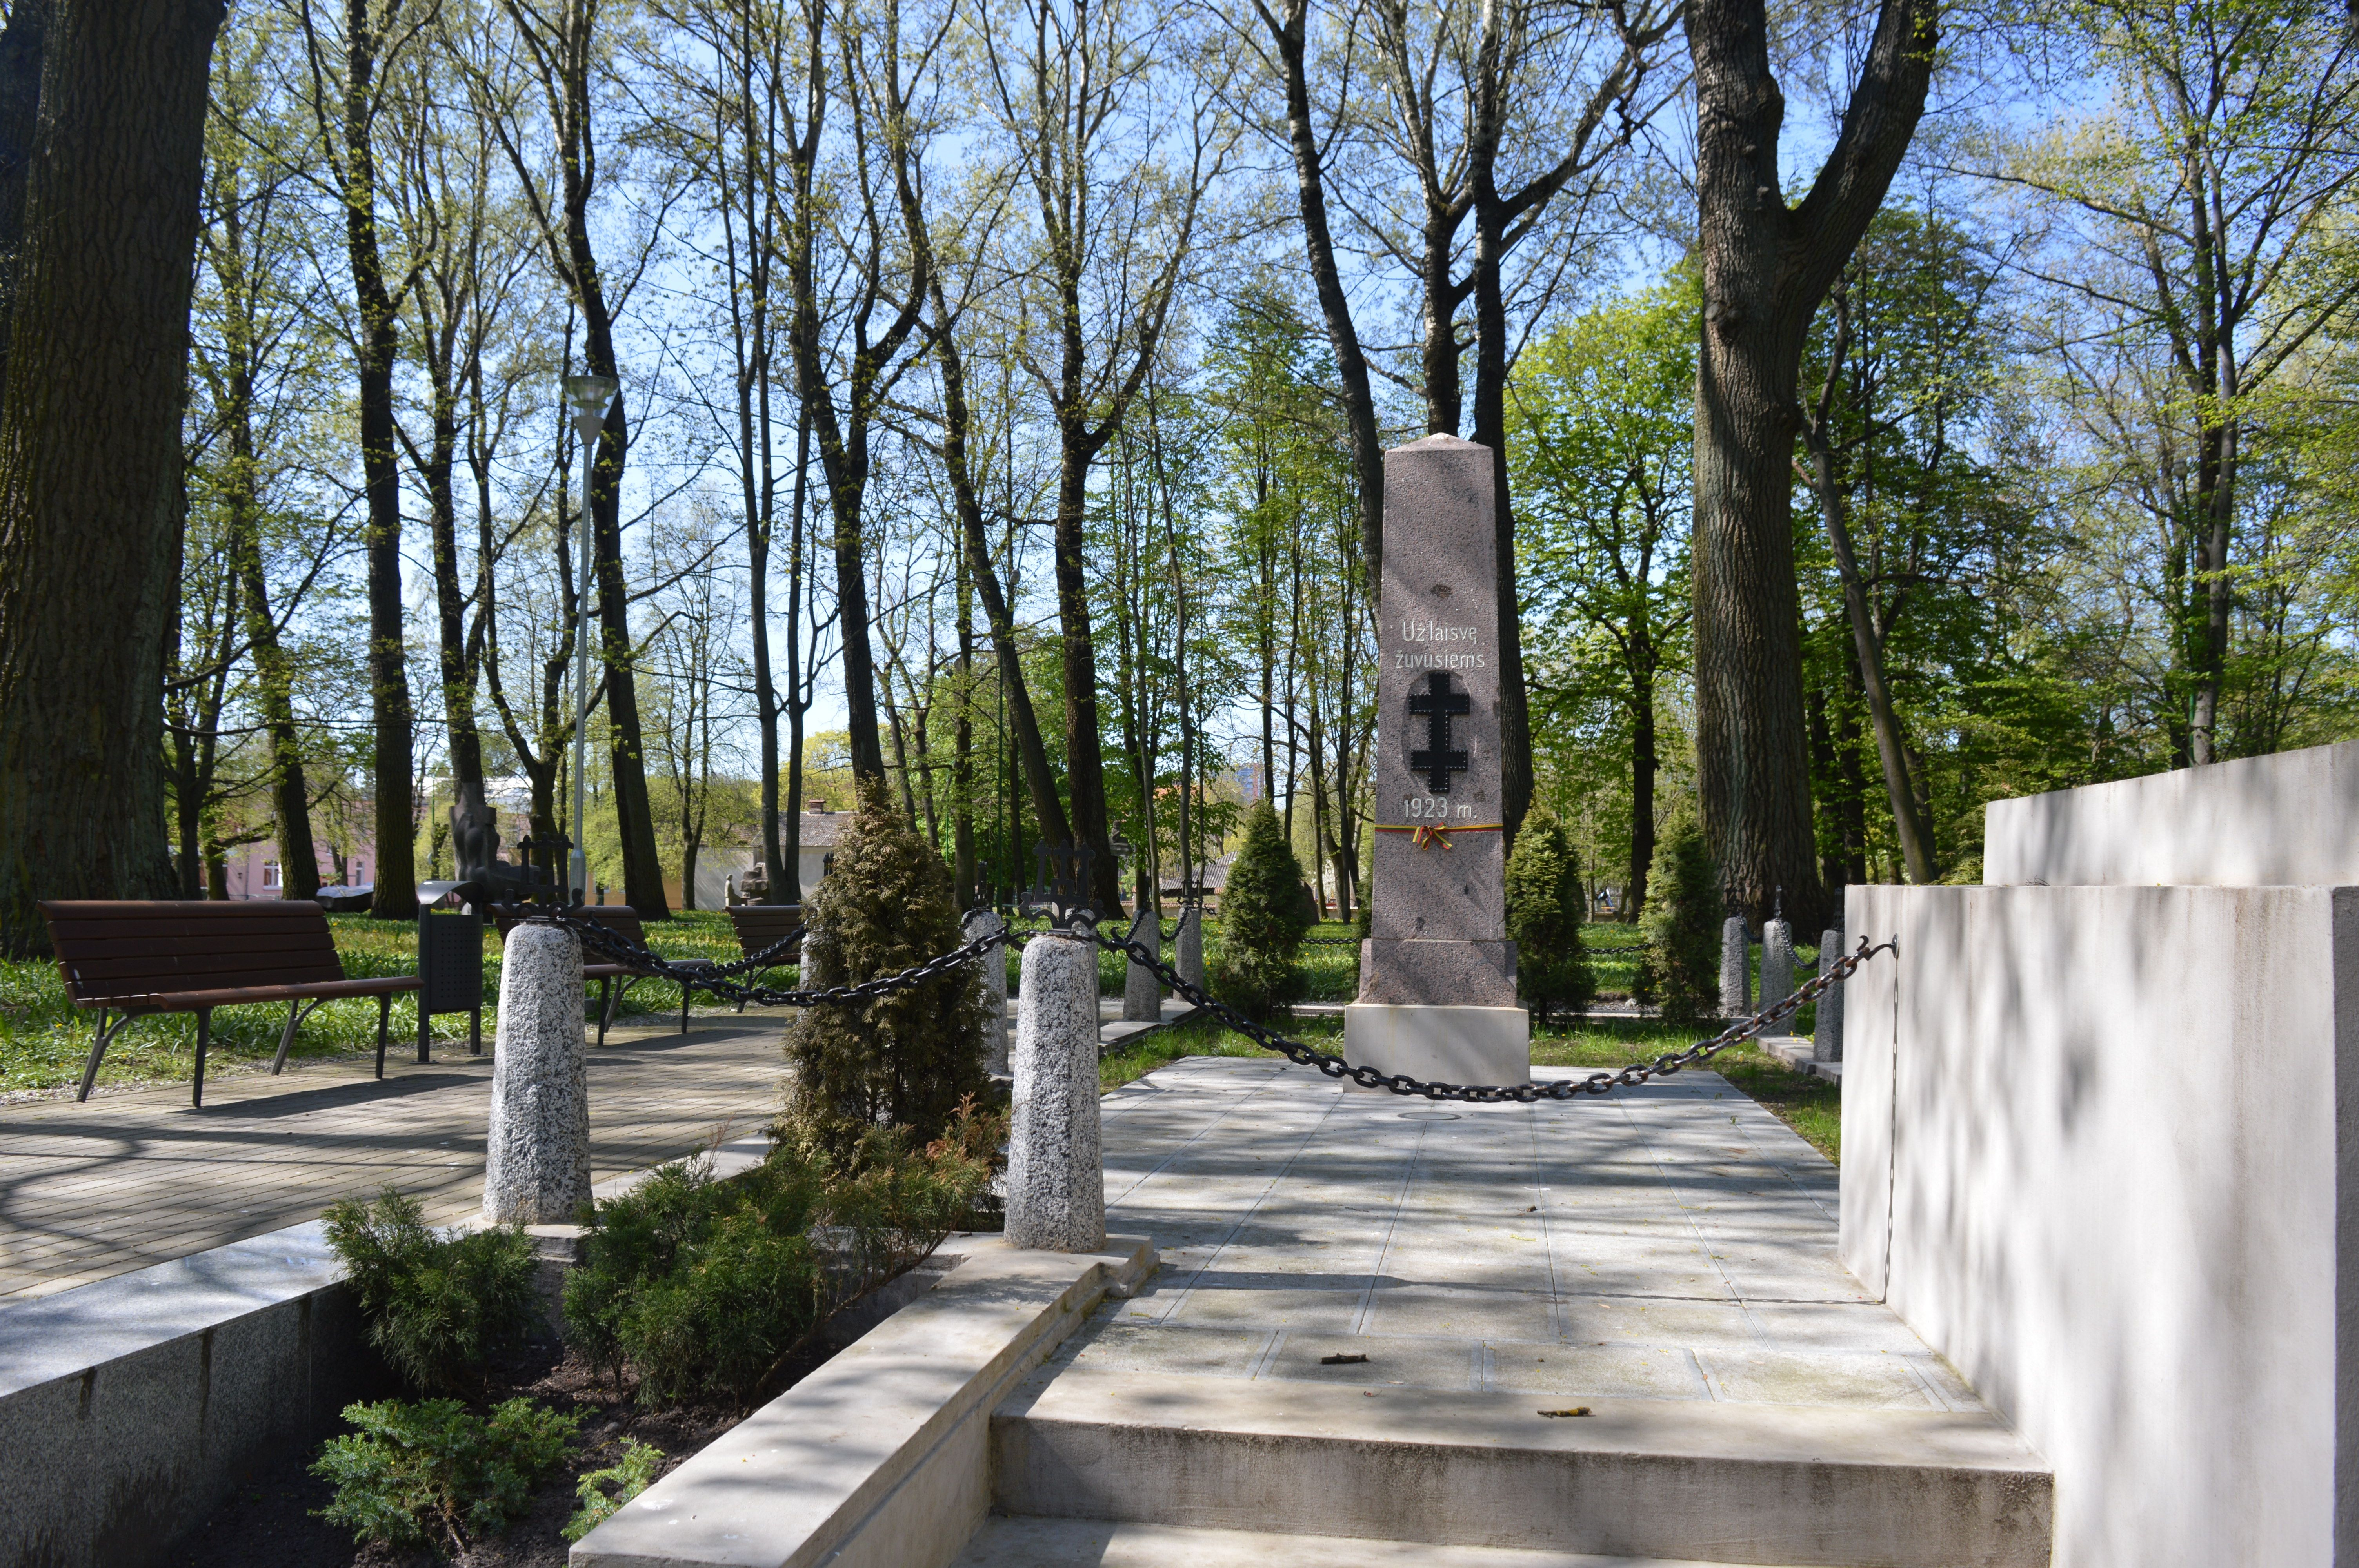 Старая часть города Клайпеды Парк скульптур - Клайпеда.